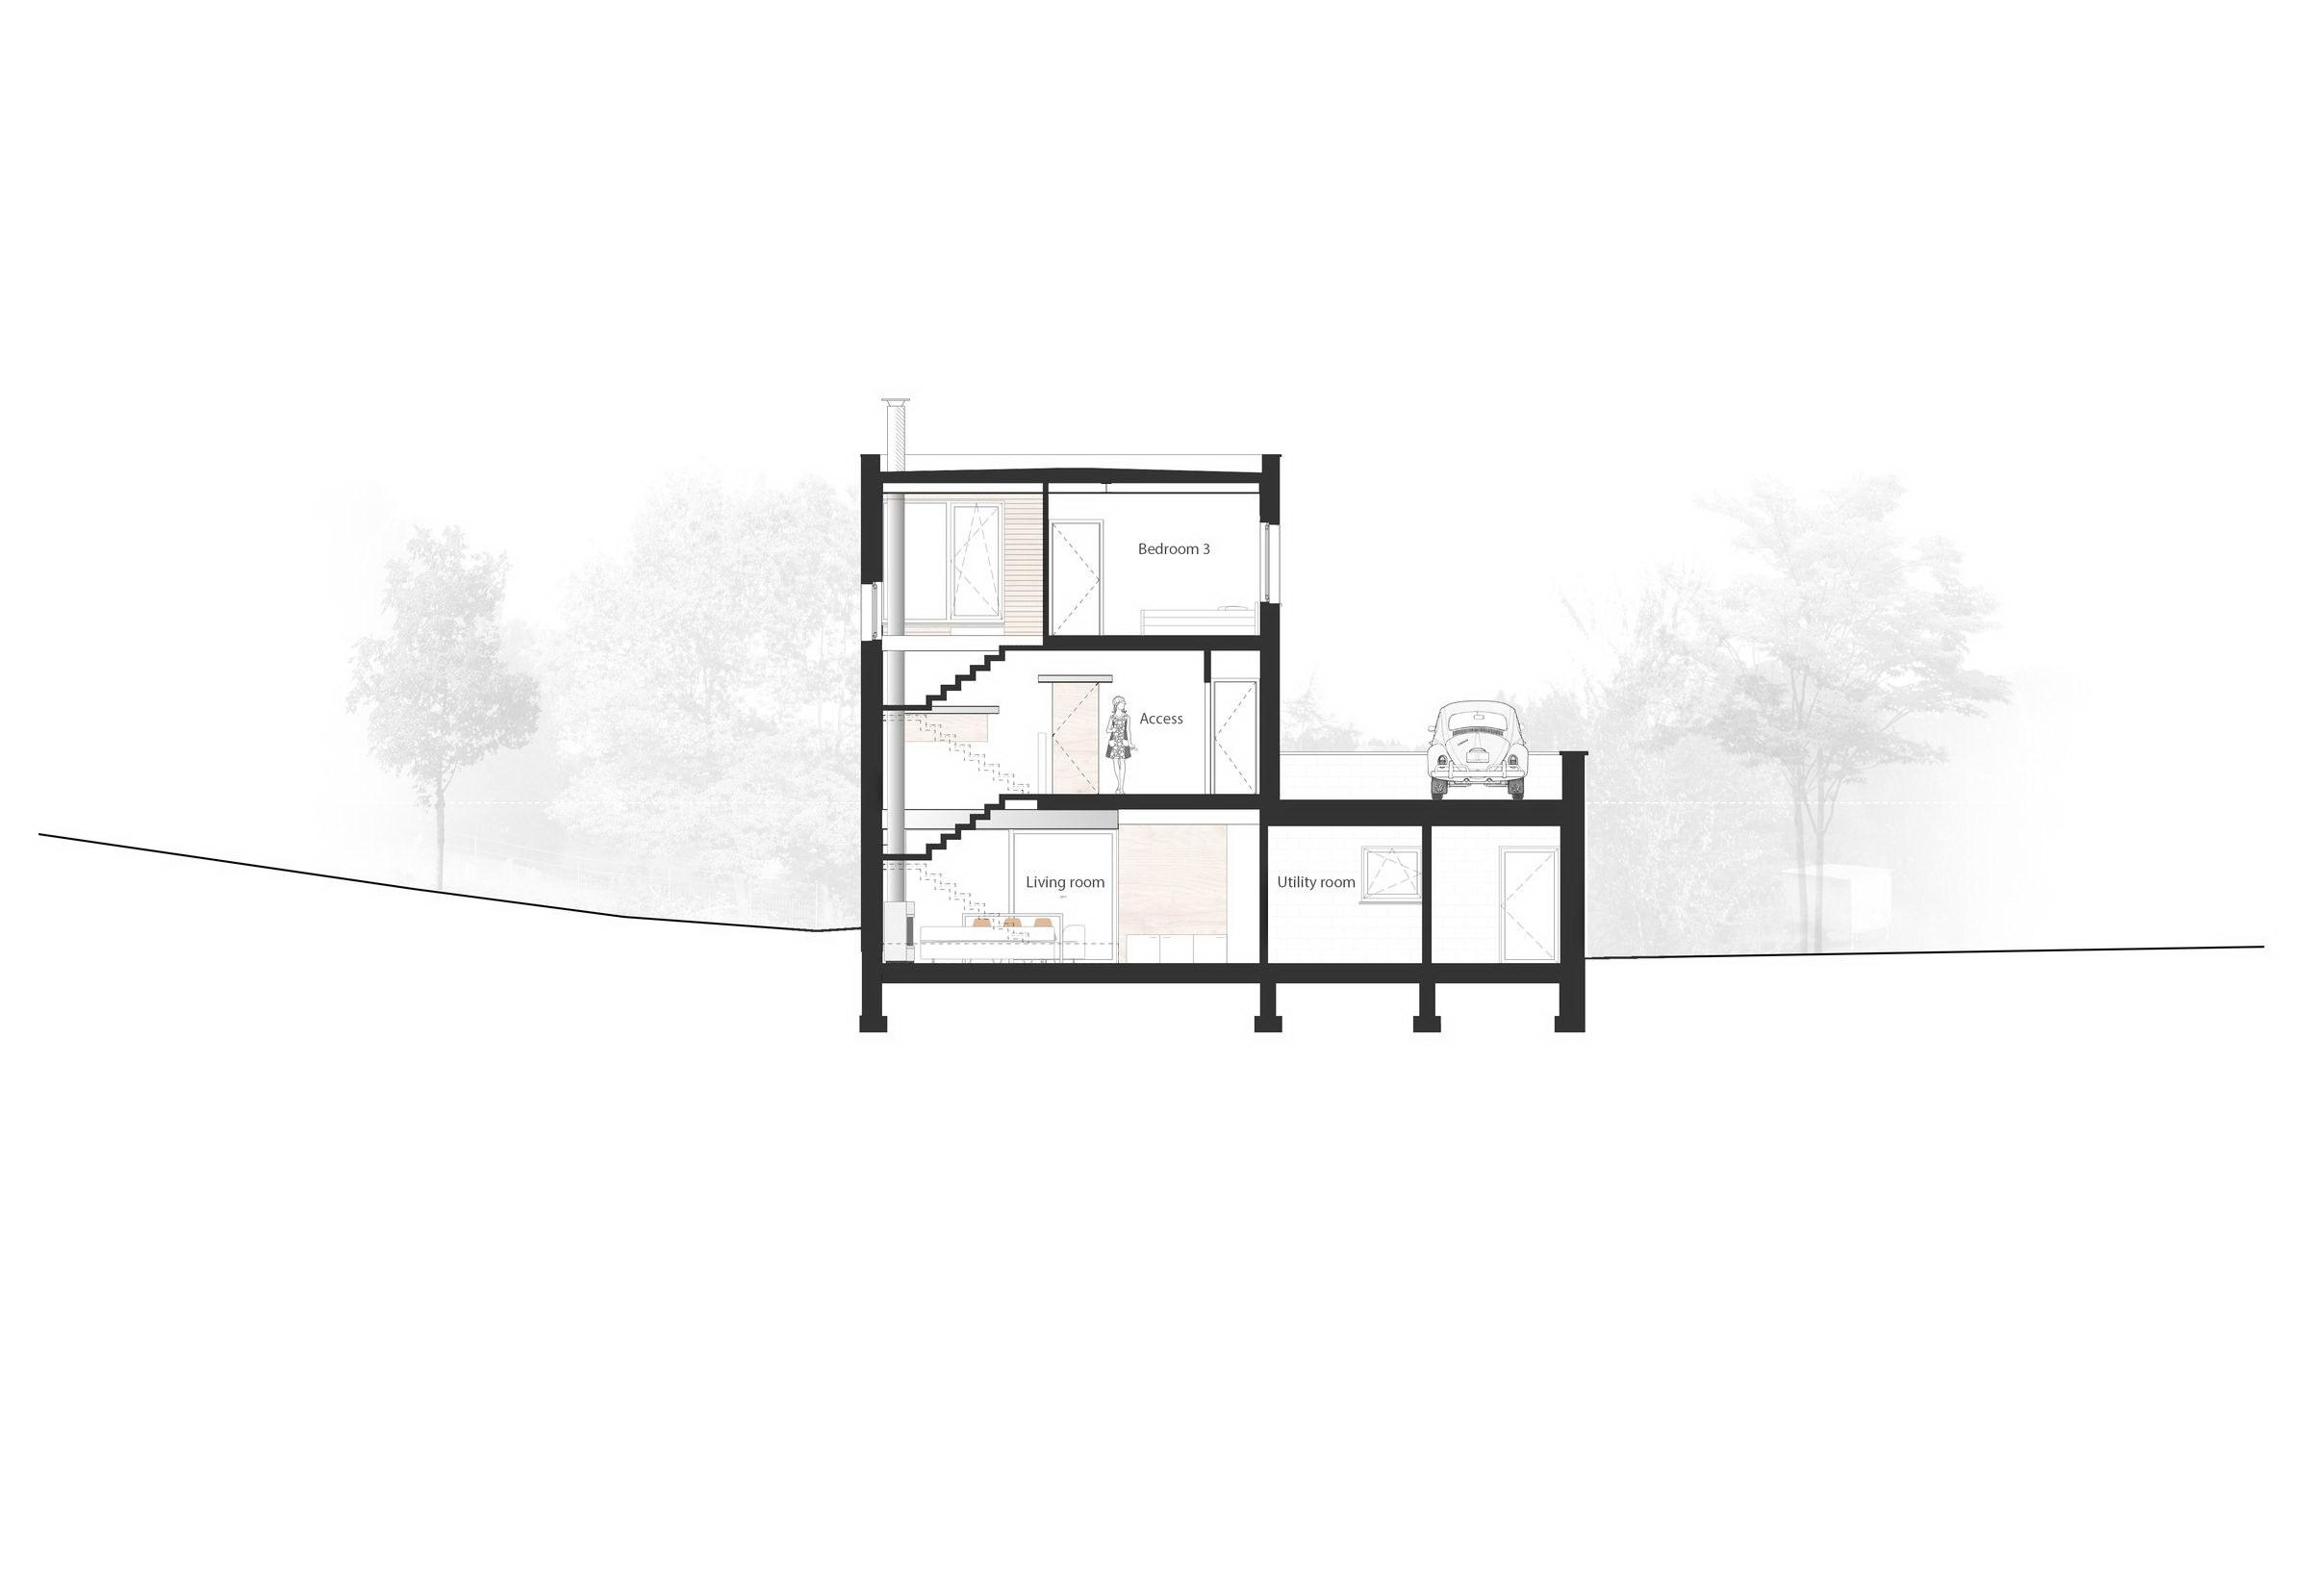 Simplexity by URBAN architectes